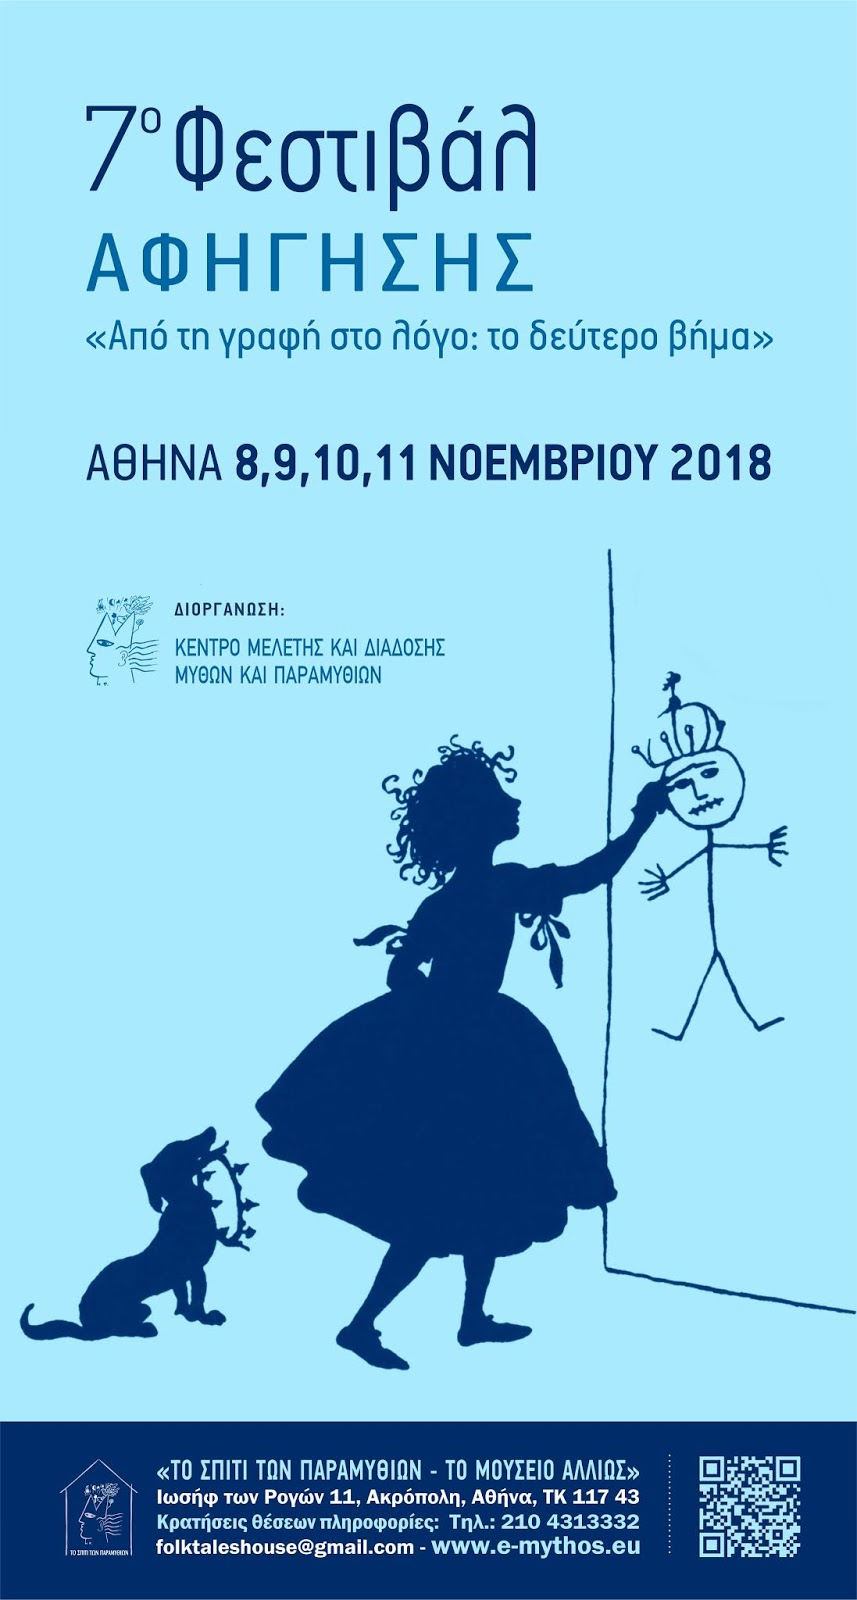 afisa-afhghsh2018-01 (1)